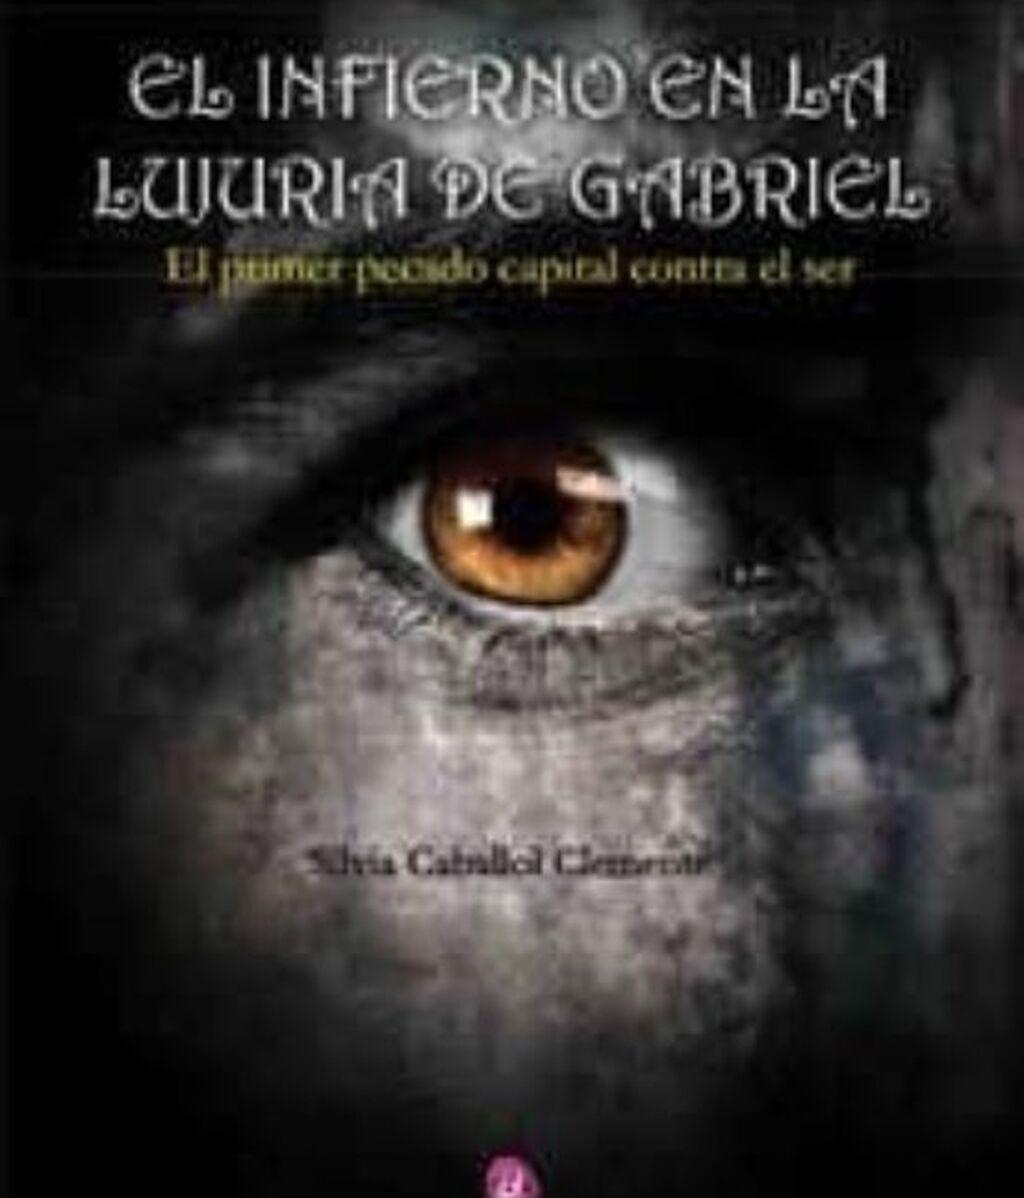 El infierno en la lujuria de Gabriel (Silvia Caballol)